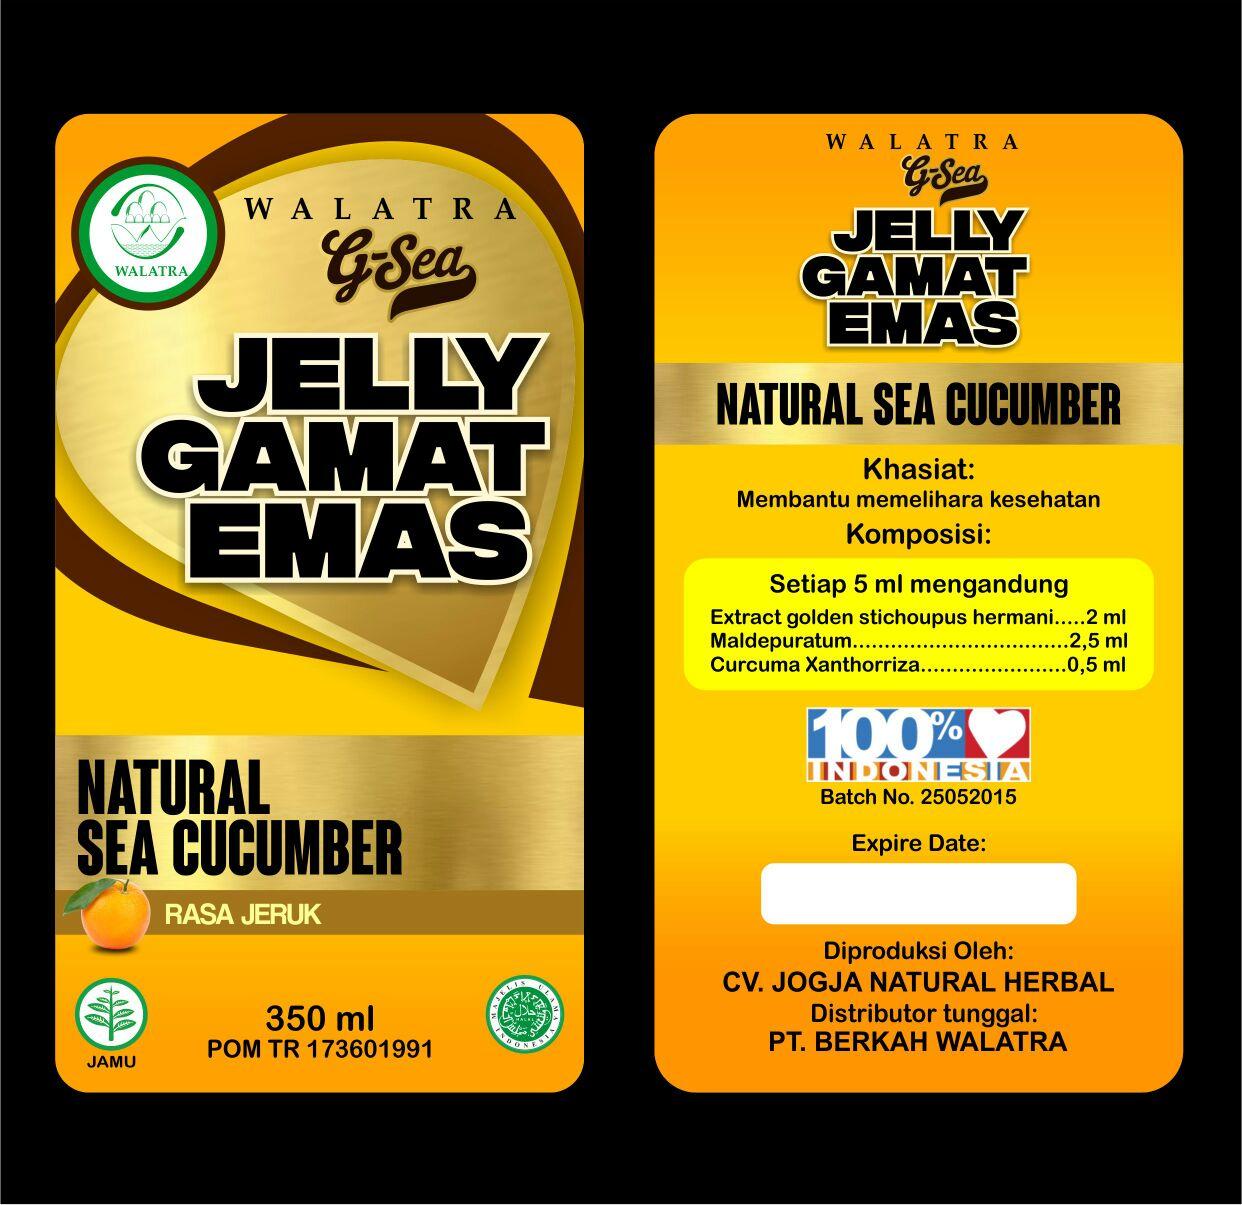 Apotik Jual Jelly Gamat Di Banda Aceh Toko Qnc Sehubungan Belum Tersedianya Agen Resmi Dan Yang Sekiranya Kami Buka Kesempatan Seluas Luasnya Dengan Membuka Cabang